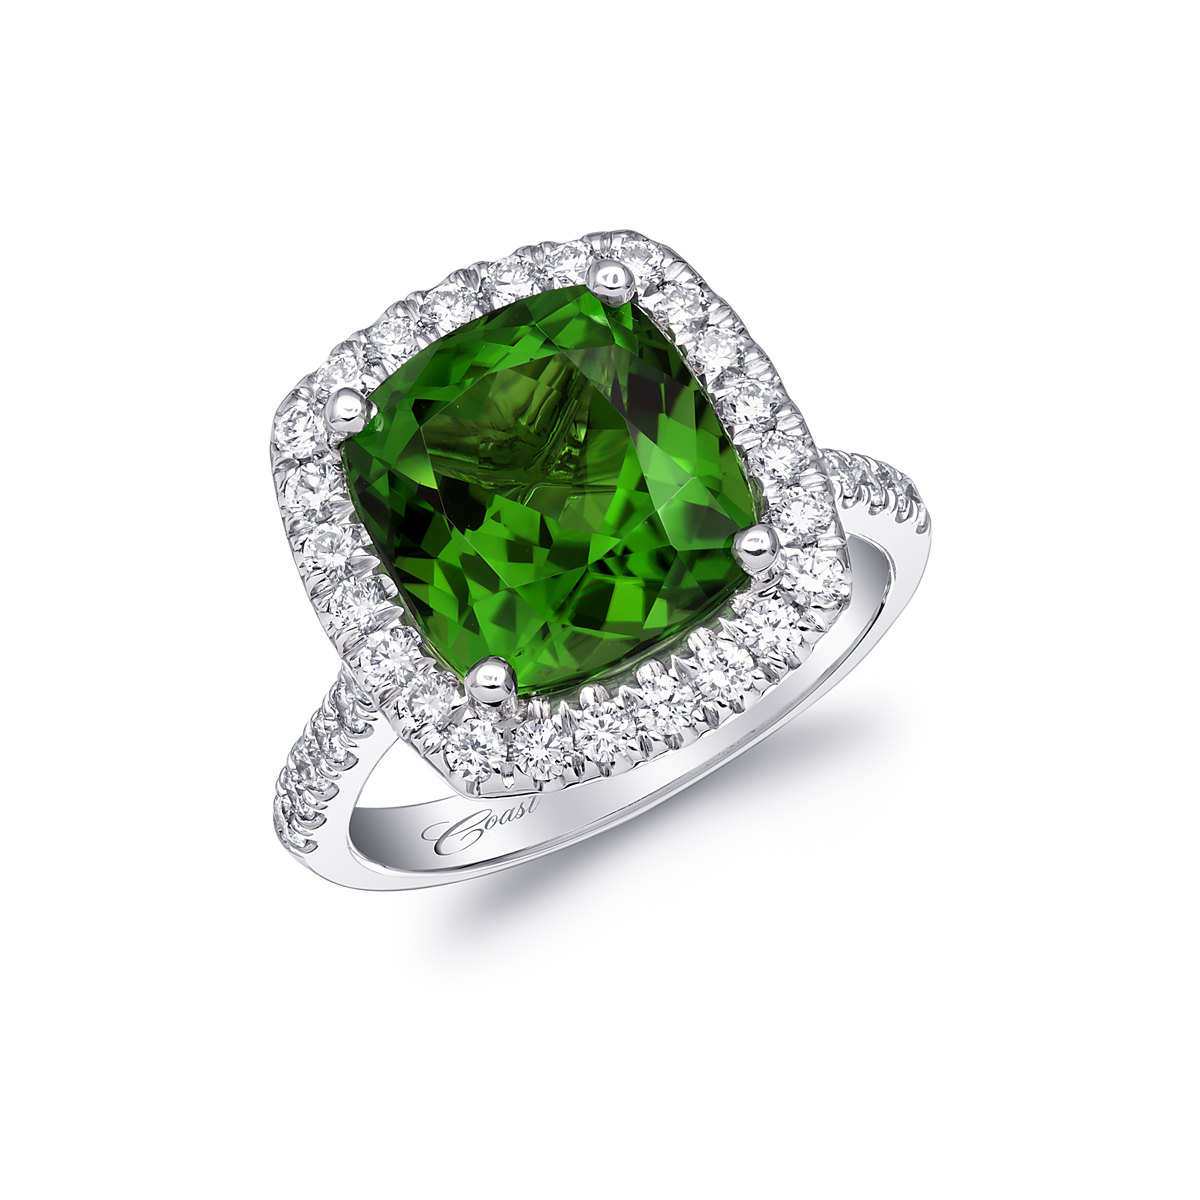 Coast Diamond Engagement Ring Of The Week 582 Carat Green Chrome Tourmaline Love Coast